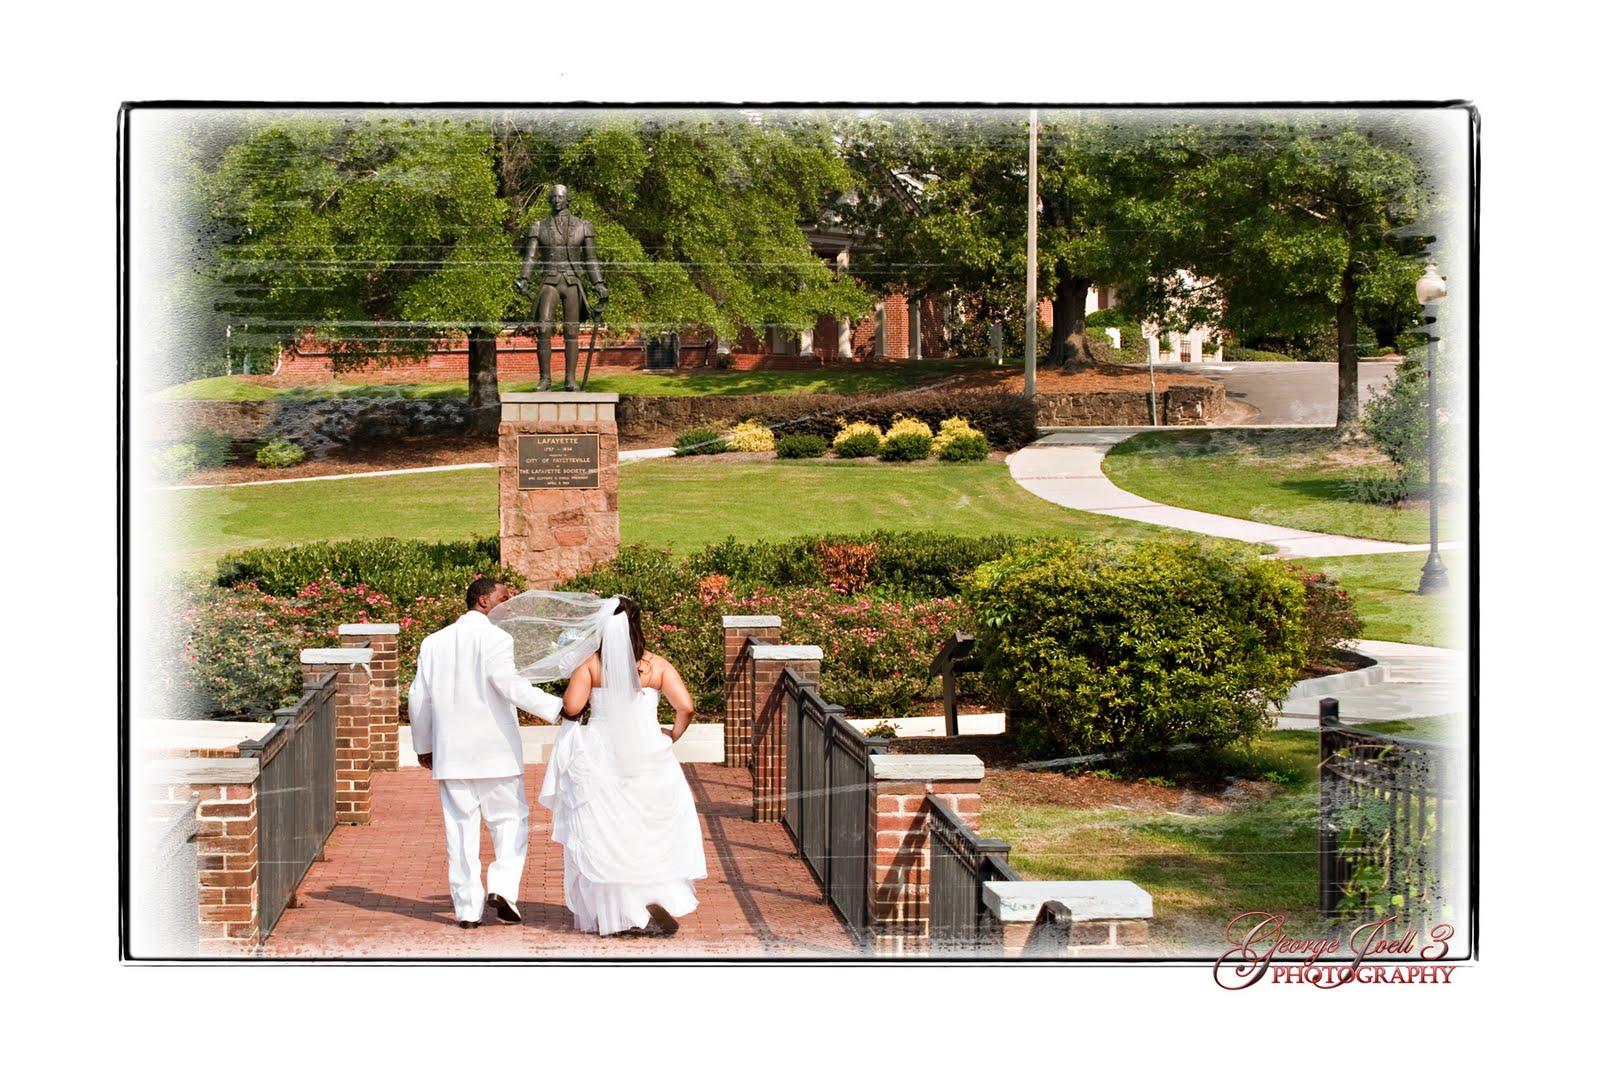 George P. Joell 3 Photography Blog - Fayetteville North Carolina ...